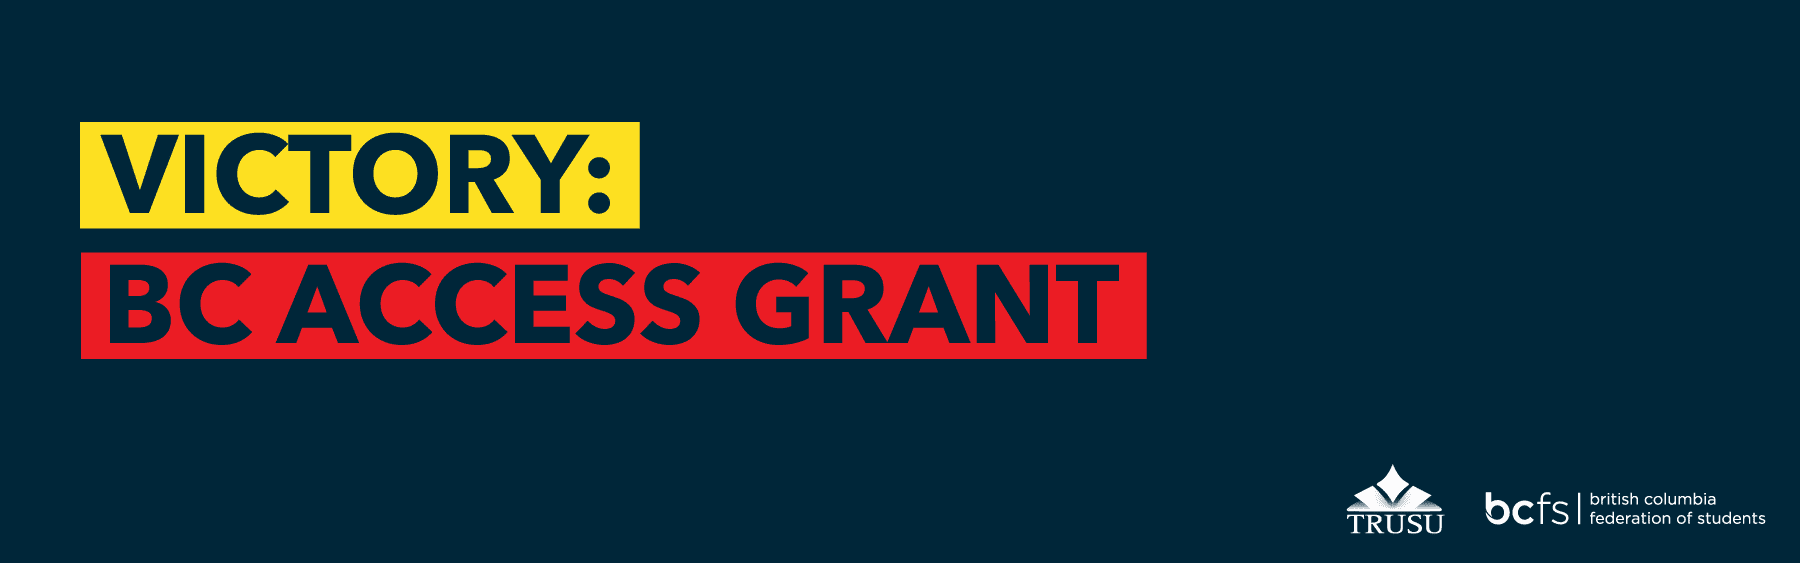 Victory BC Access Grant